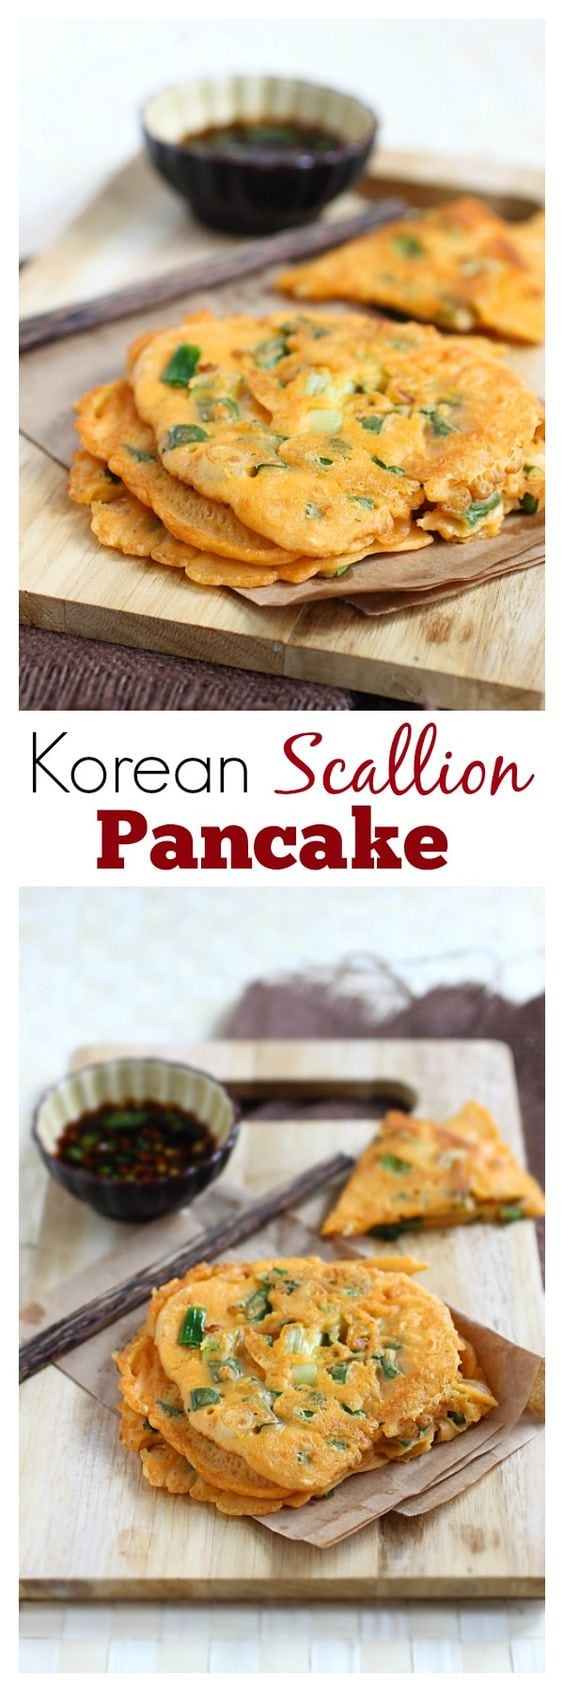 Korean Scallion Pancake (Pajeon) - savory pancake with scallion and kimchi, amazing appetizer that you can't stop eating   rasamalaysia.com